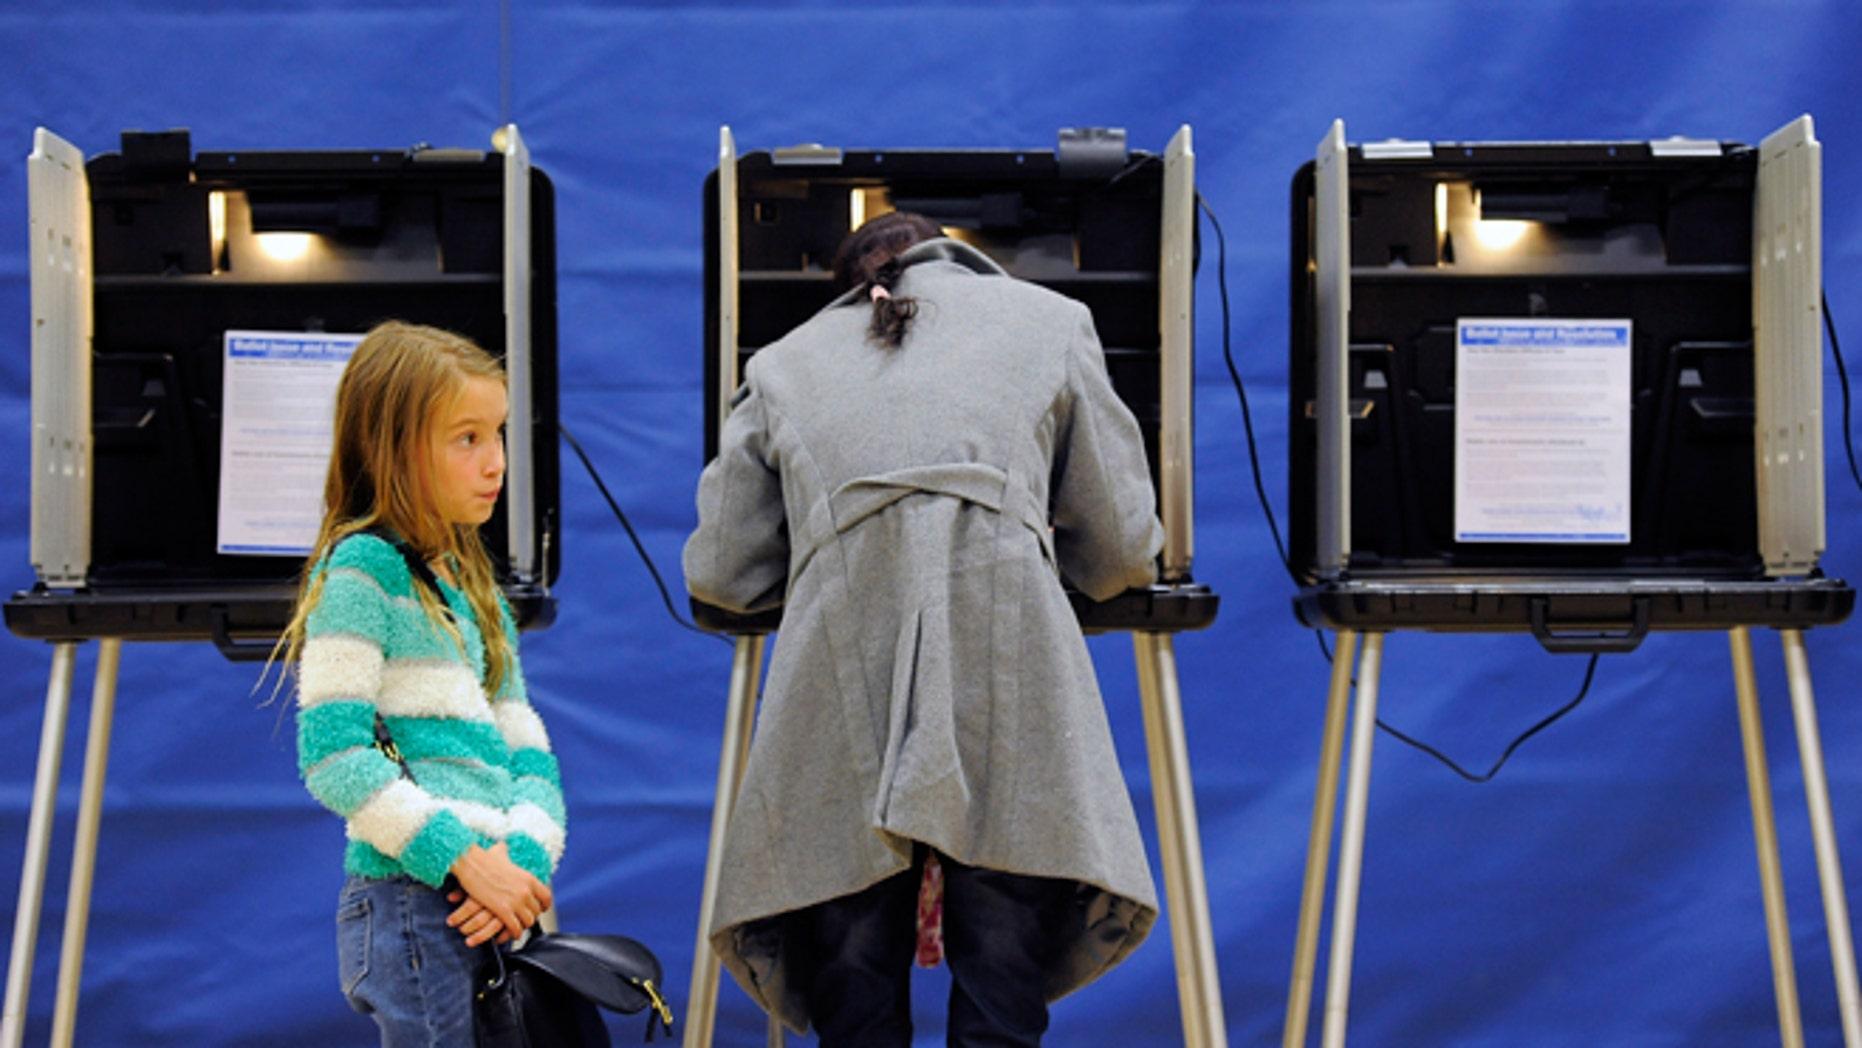 Nov. 4, 2014: Alice Kunde, 8, left, waits for her mother Laura Kunde to vote at the Barnum Recreation Center in Denver.